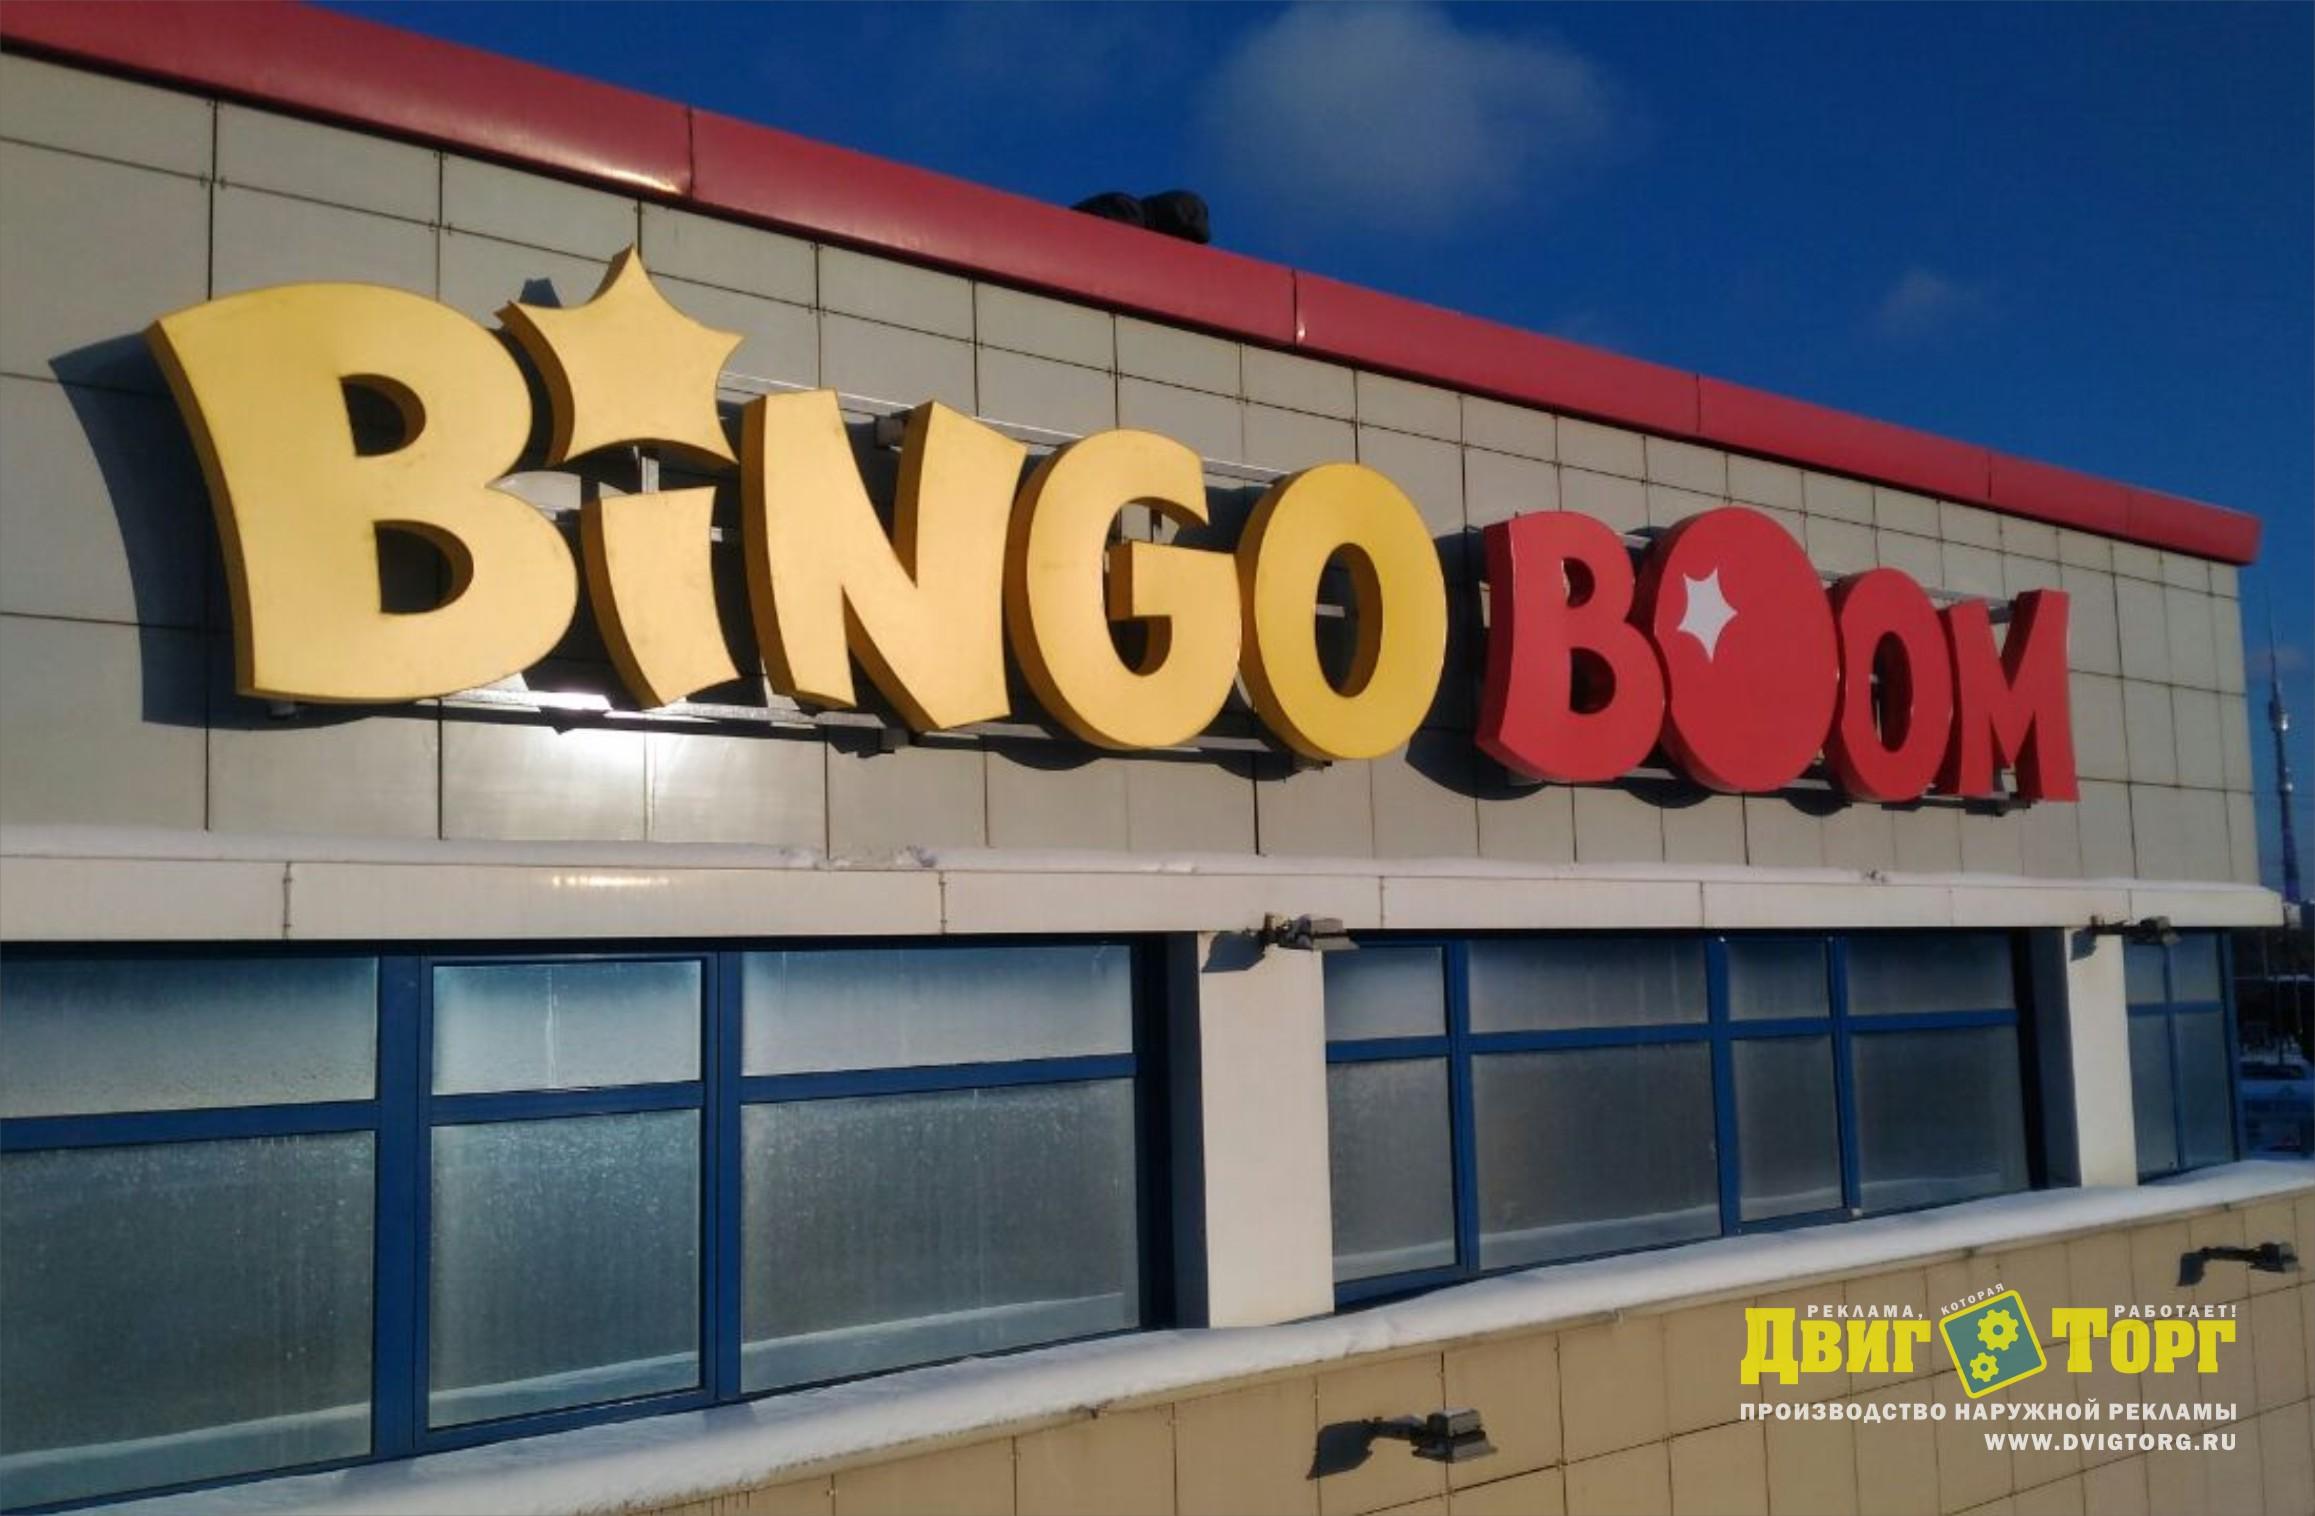 Вывеска Bingo Boom на фасад здания